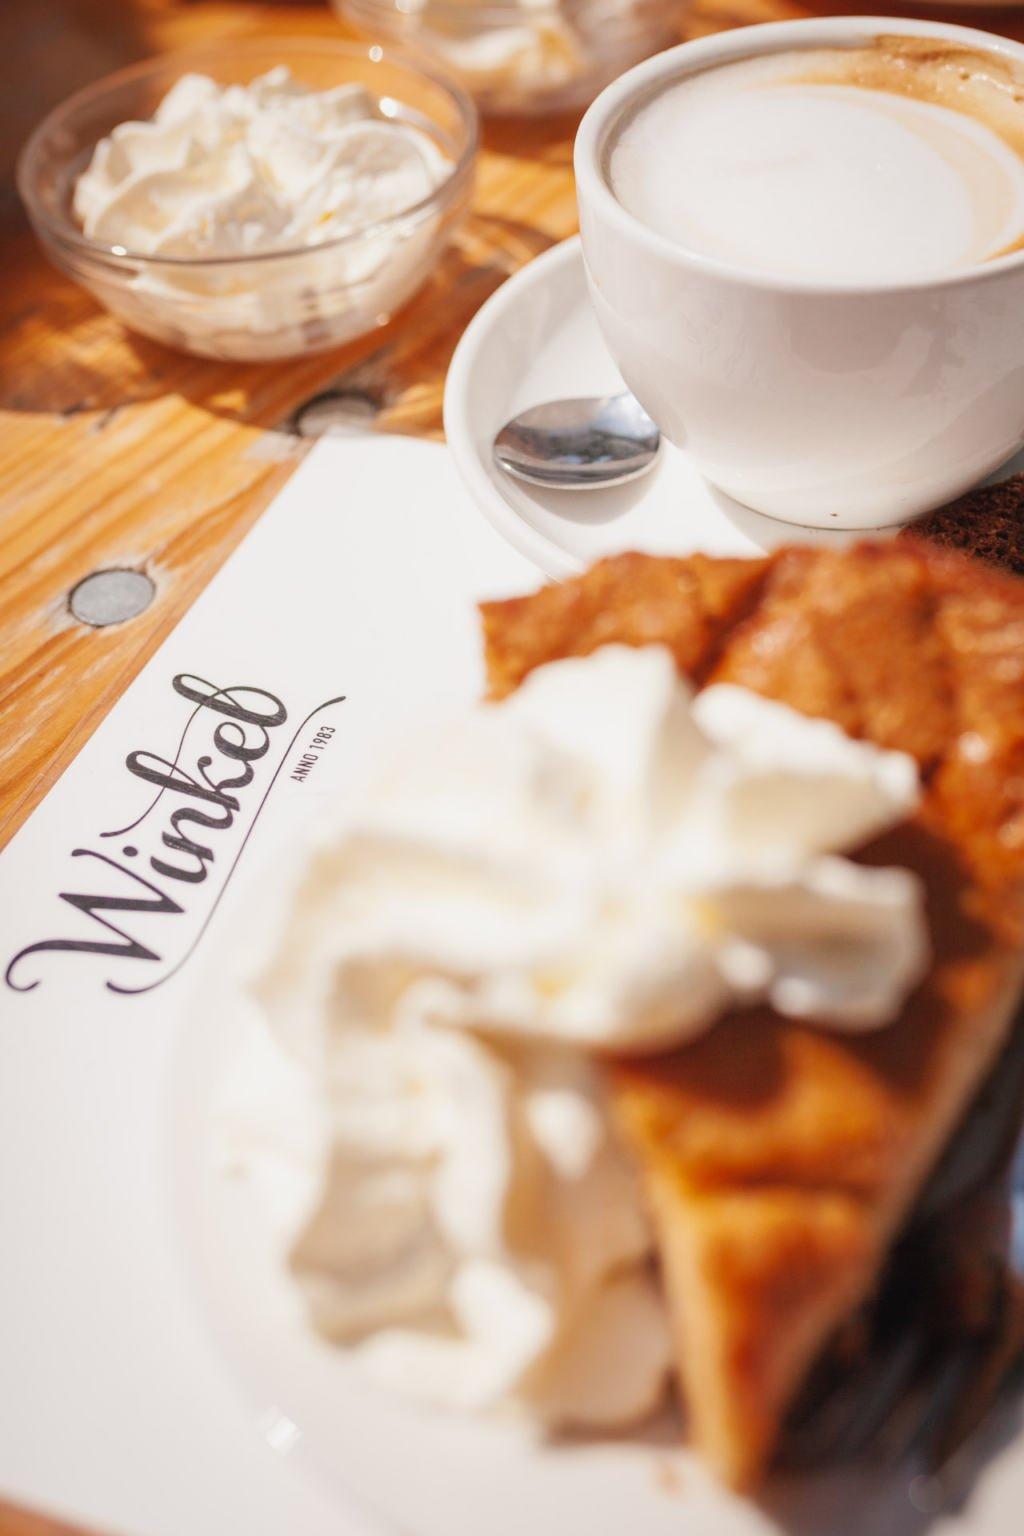 Winkel 42, Apple Pie, Amsterdam